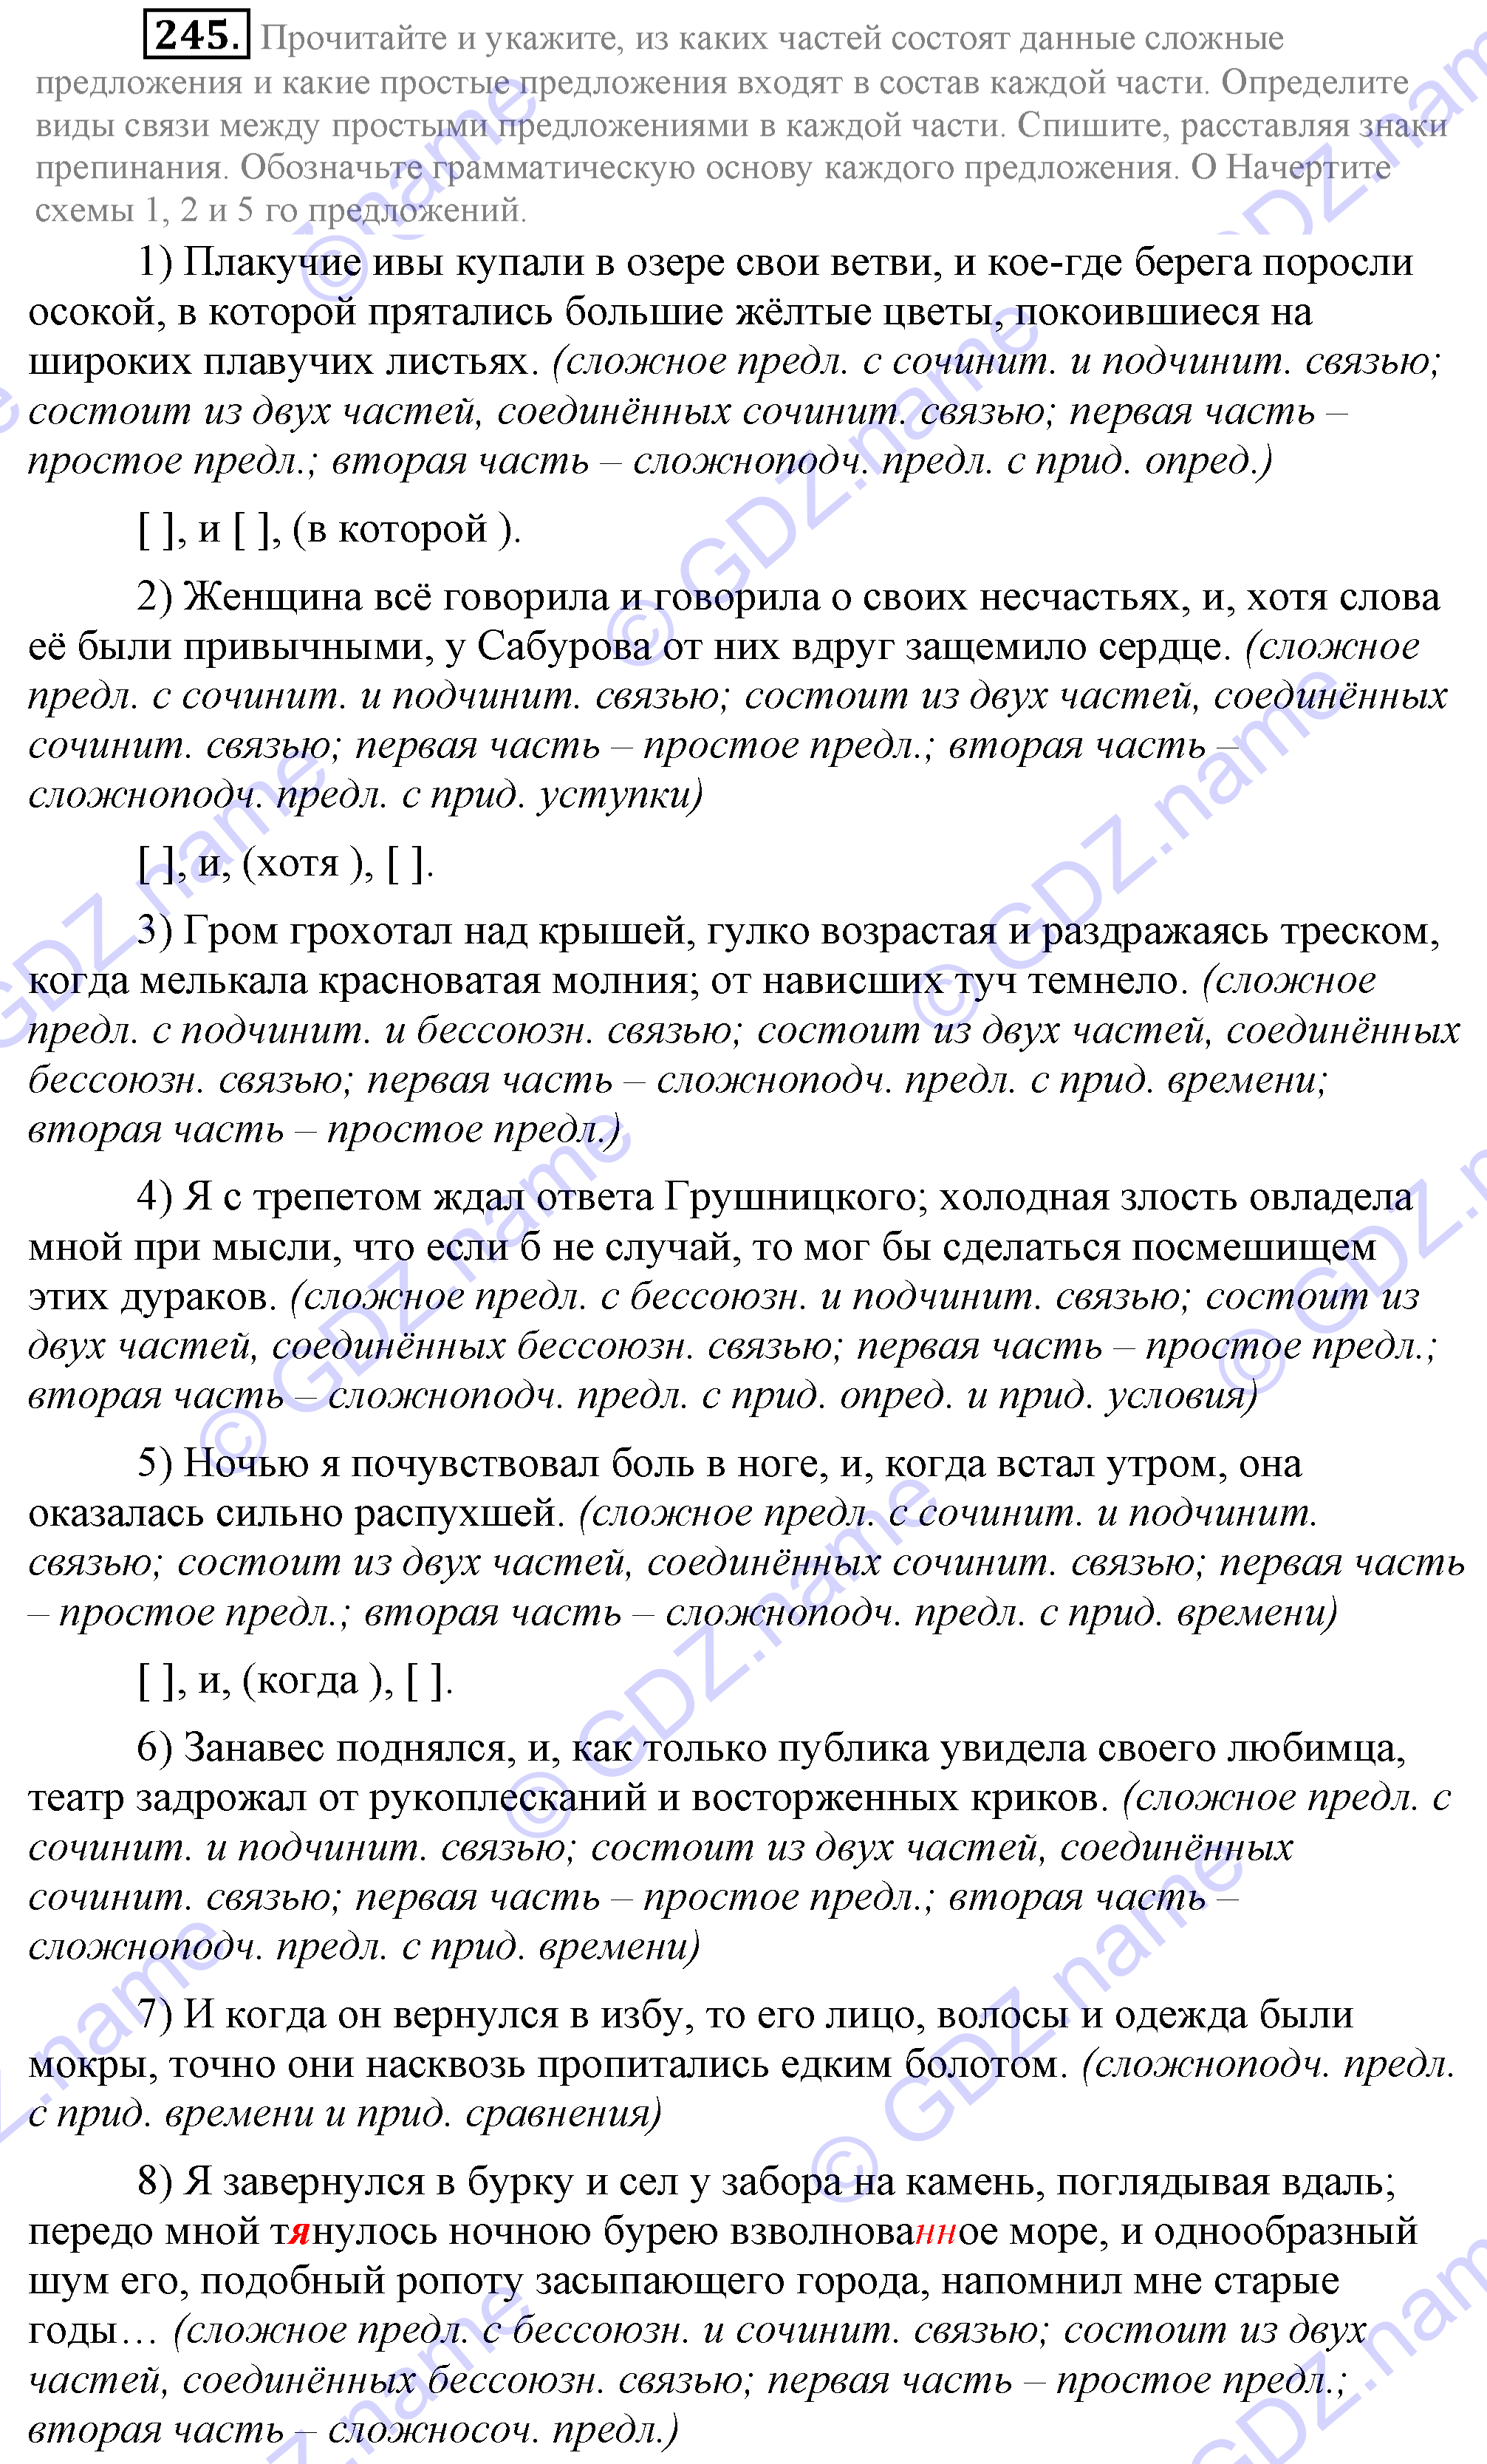 Крк елена енькка 6 класс 11 параграф